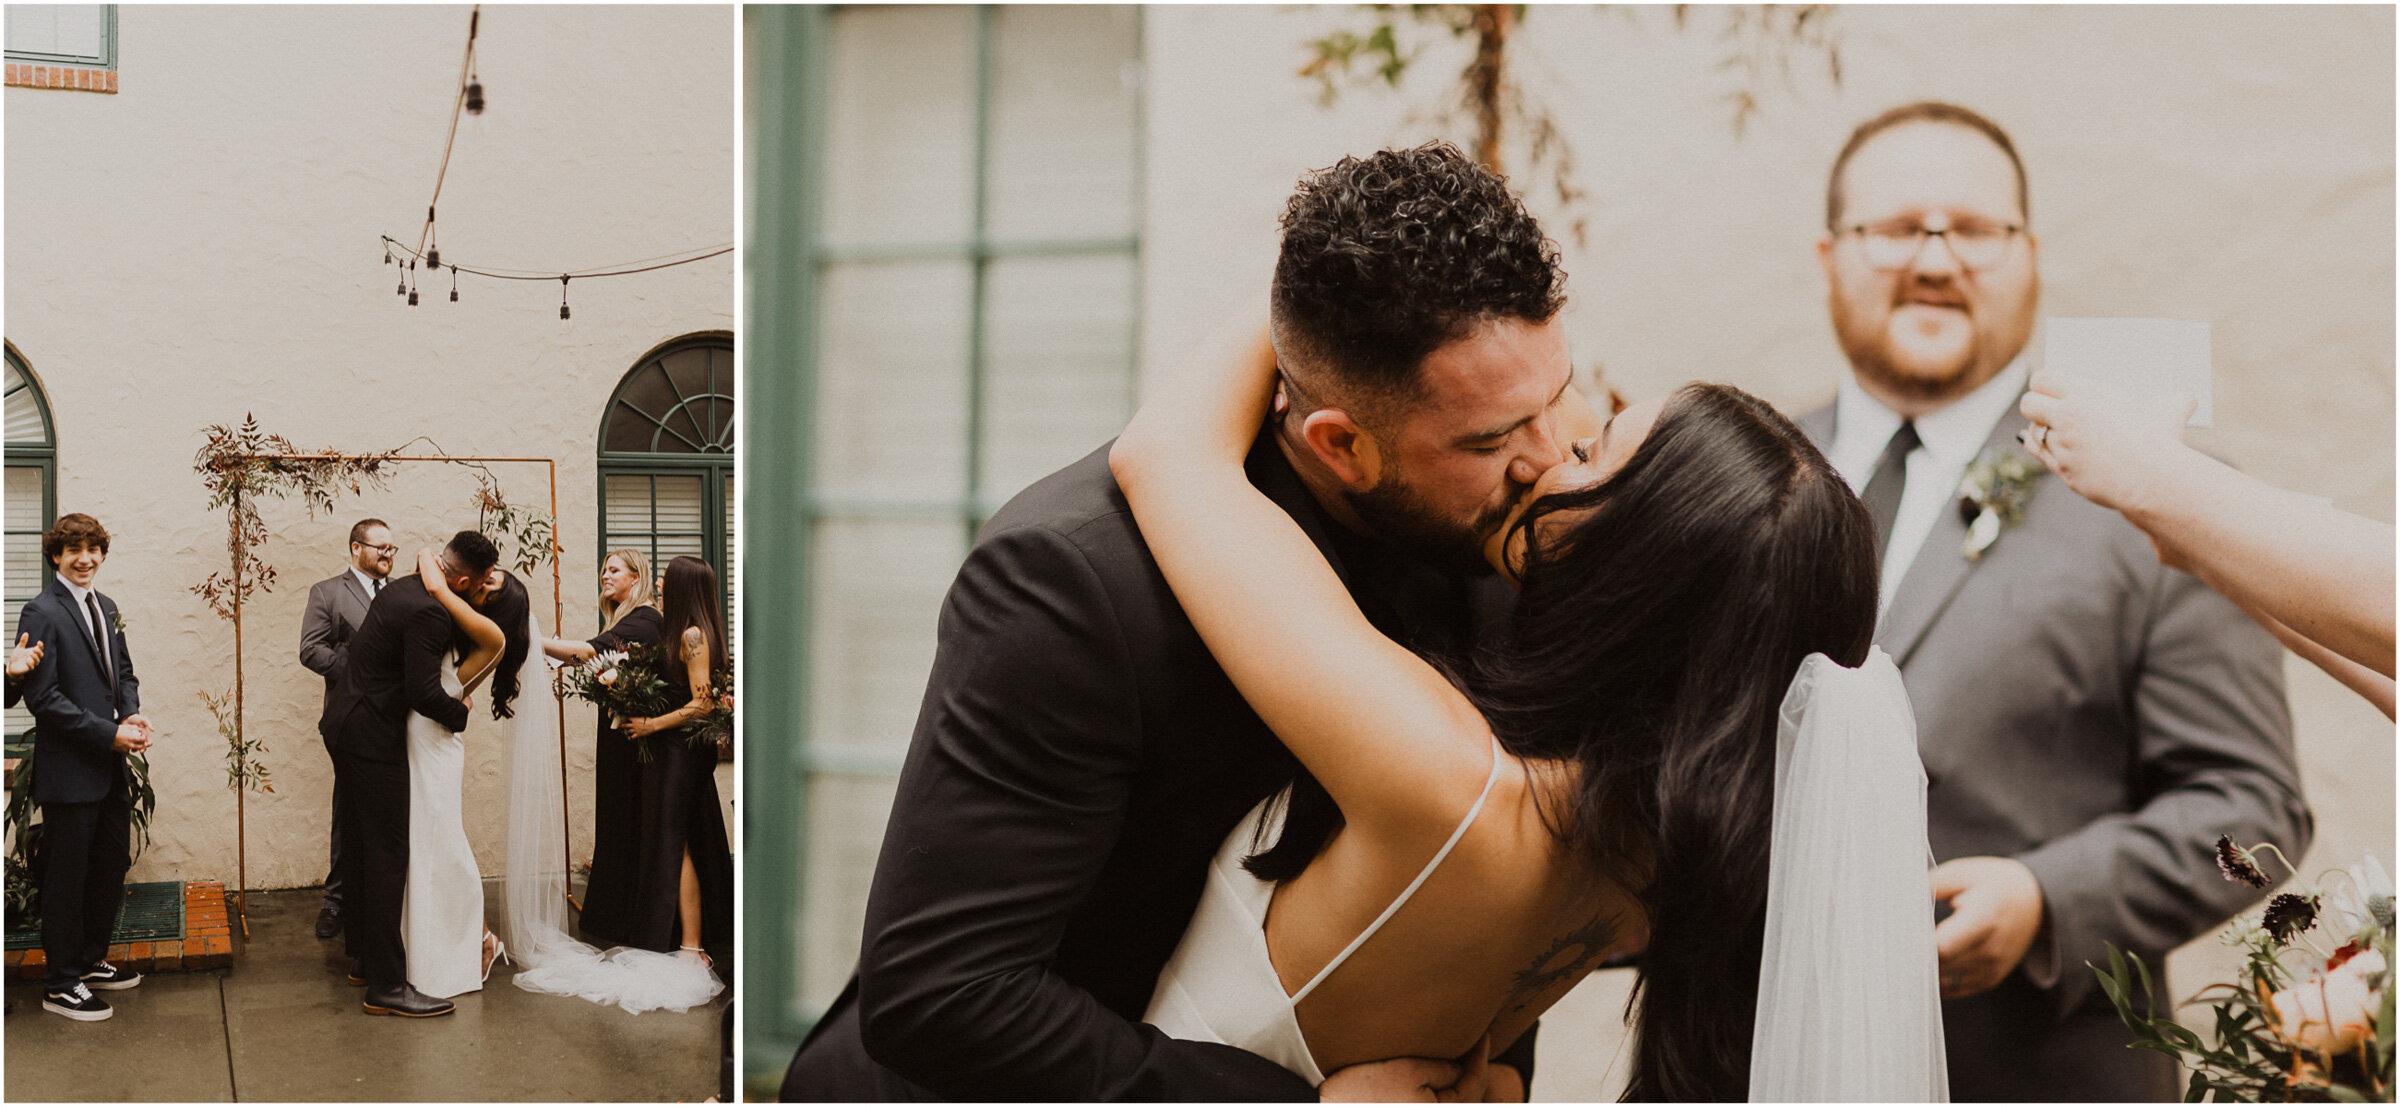 alyssa barletter photography la villa kansas city patio wedding sarah seven wedding dress-15.jpg